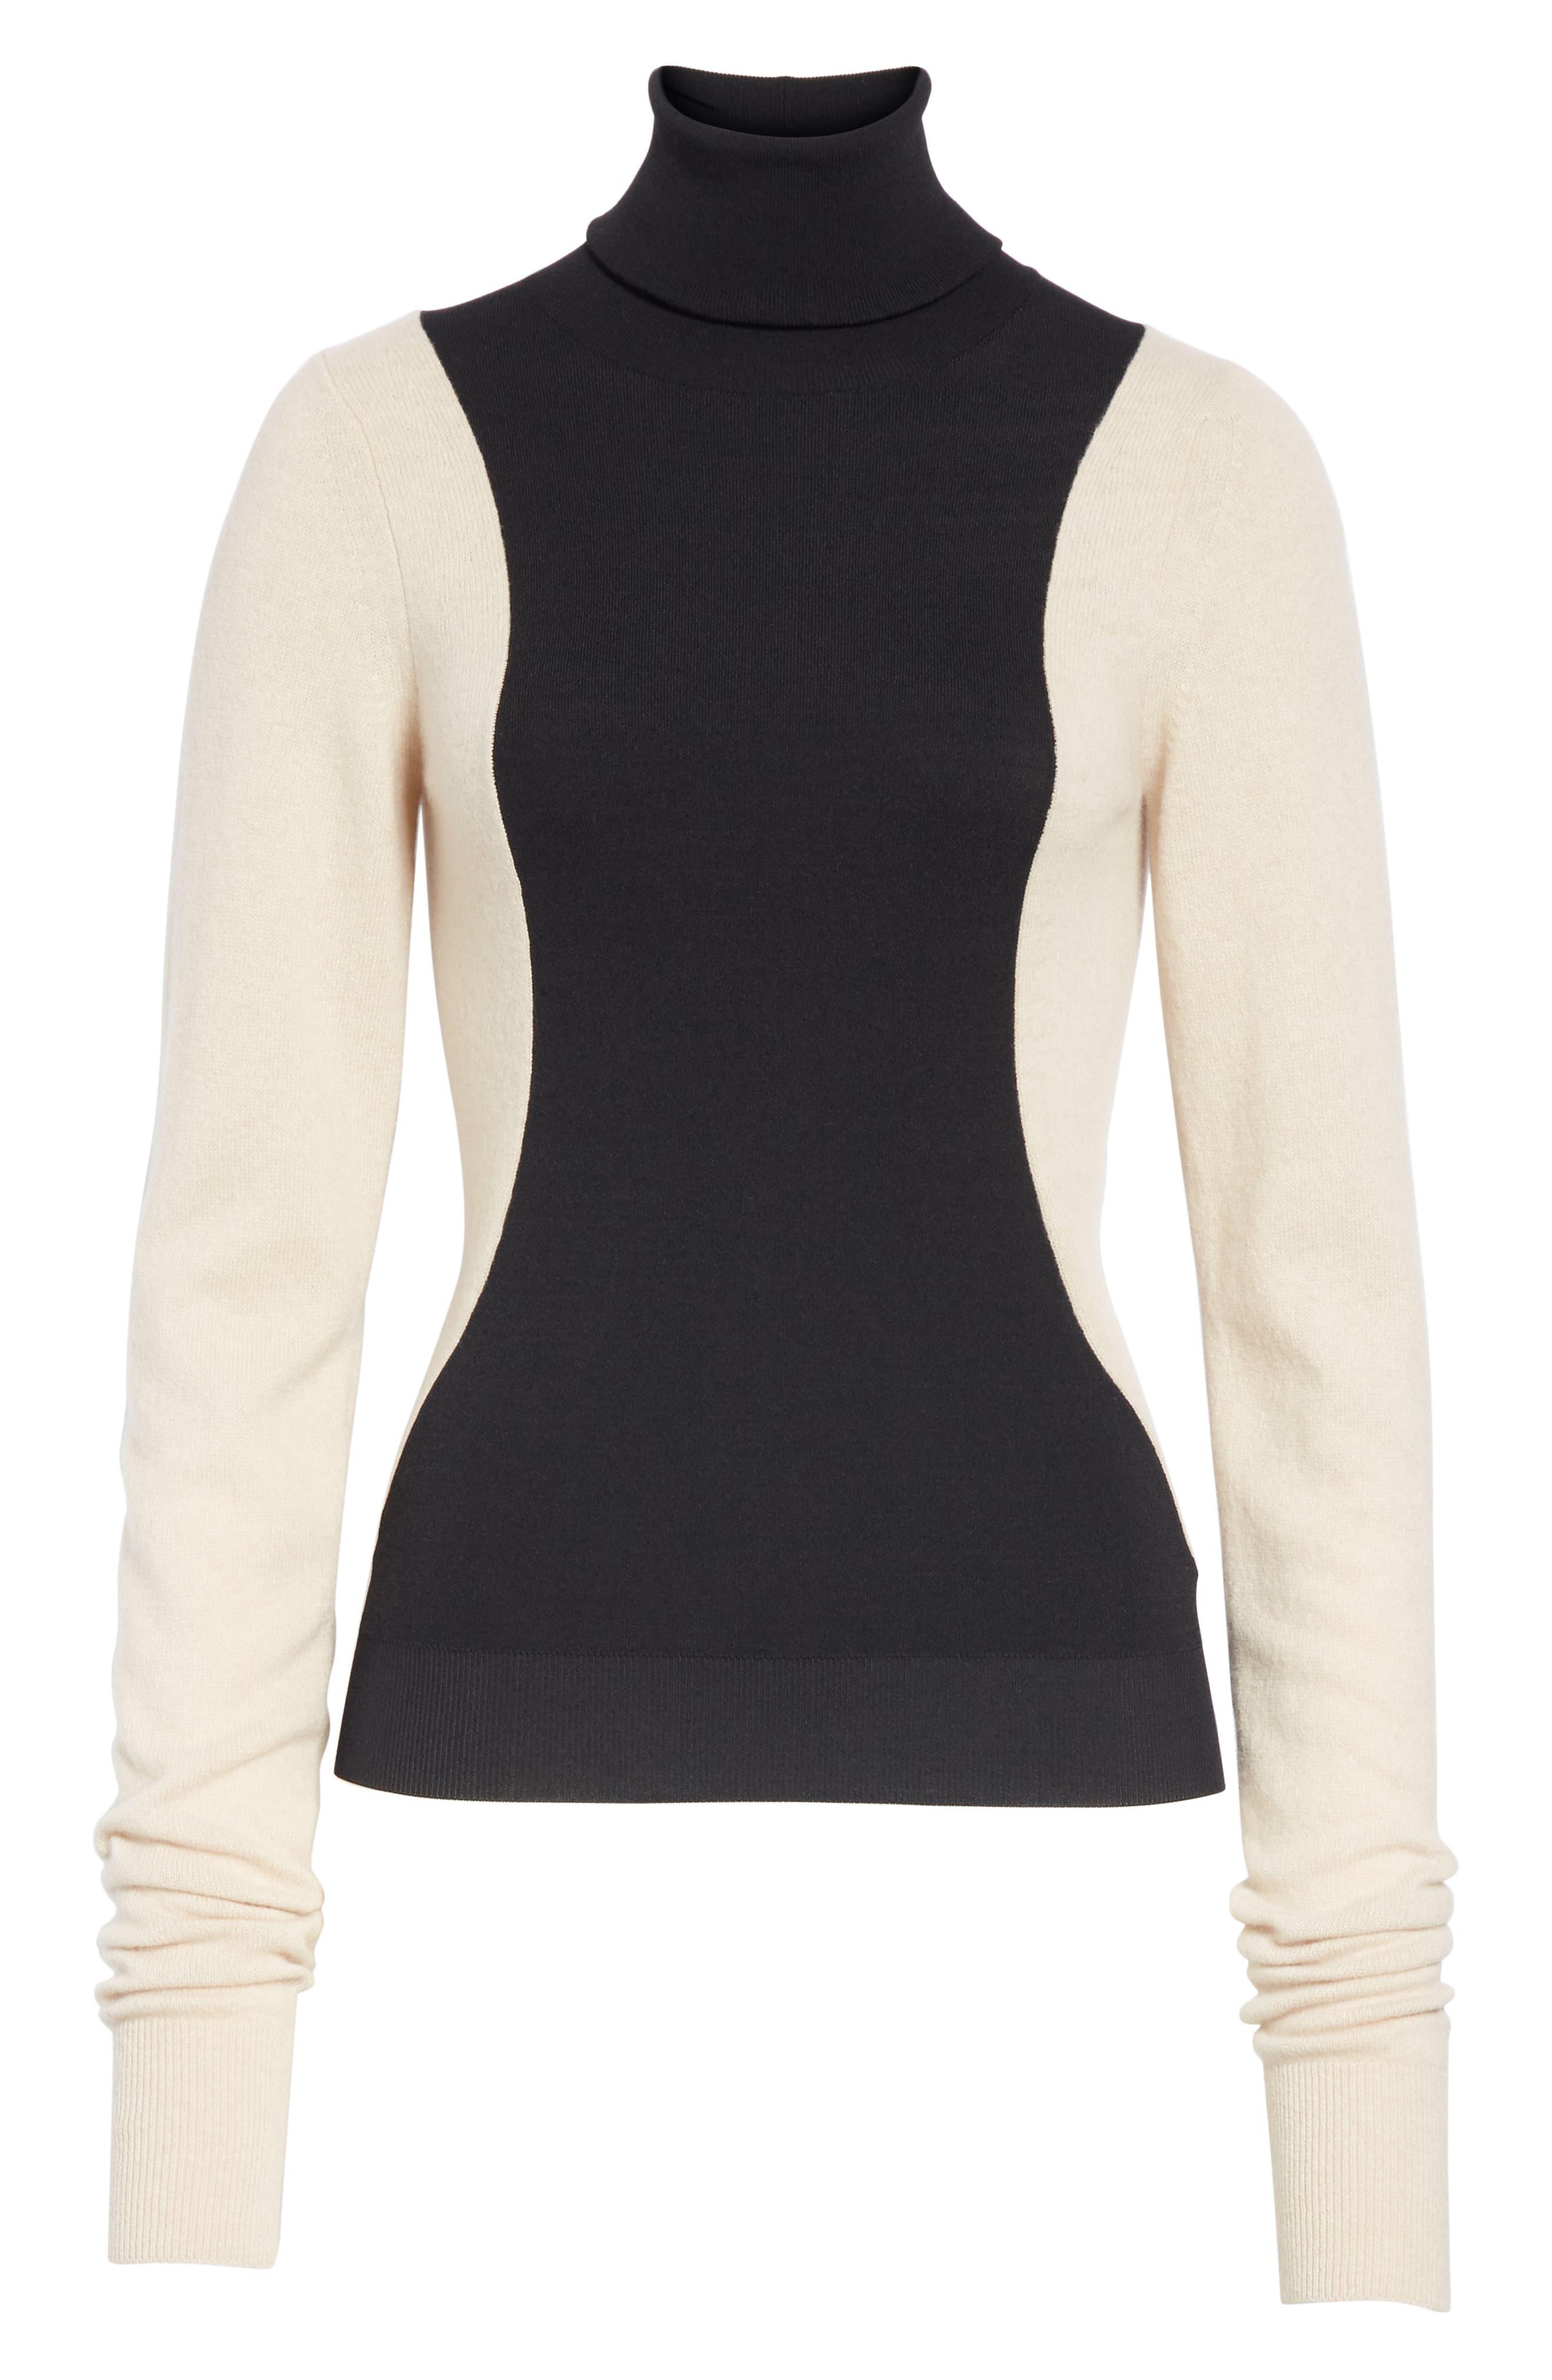 Colorblock Wool Blend Turtleneck Sweater,                             Alternate thumbnail 6, color,                             BLACK/ NUT